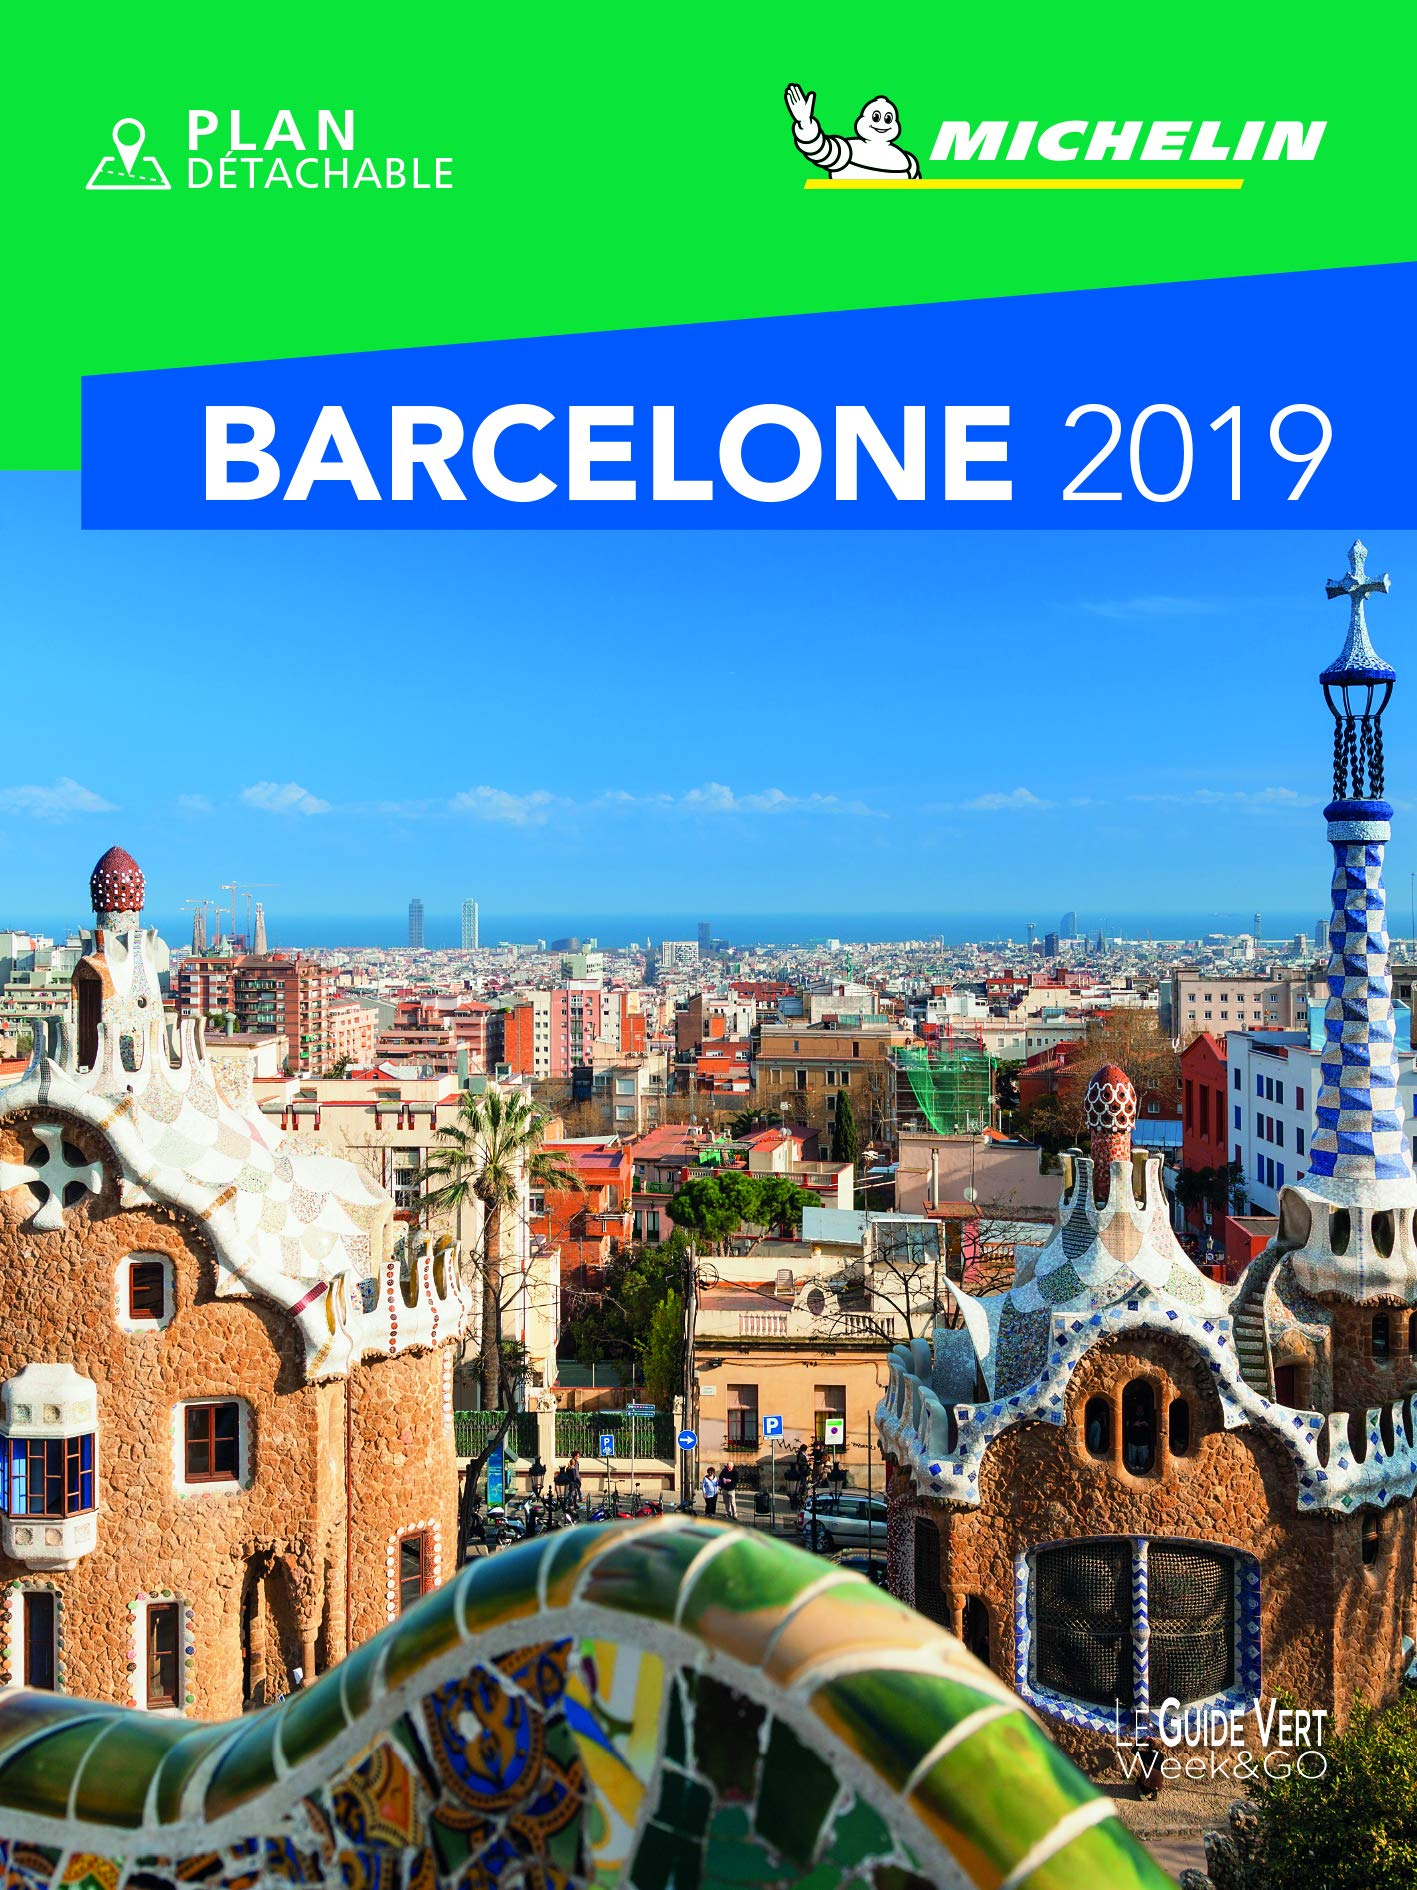 Guide Vert Week&GO Barcelone Michelin 2019 Poche – 15 octobre 2018 206723742X Voyages / Guides touristiques Espagne-catalogne Europe